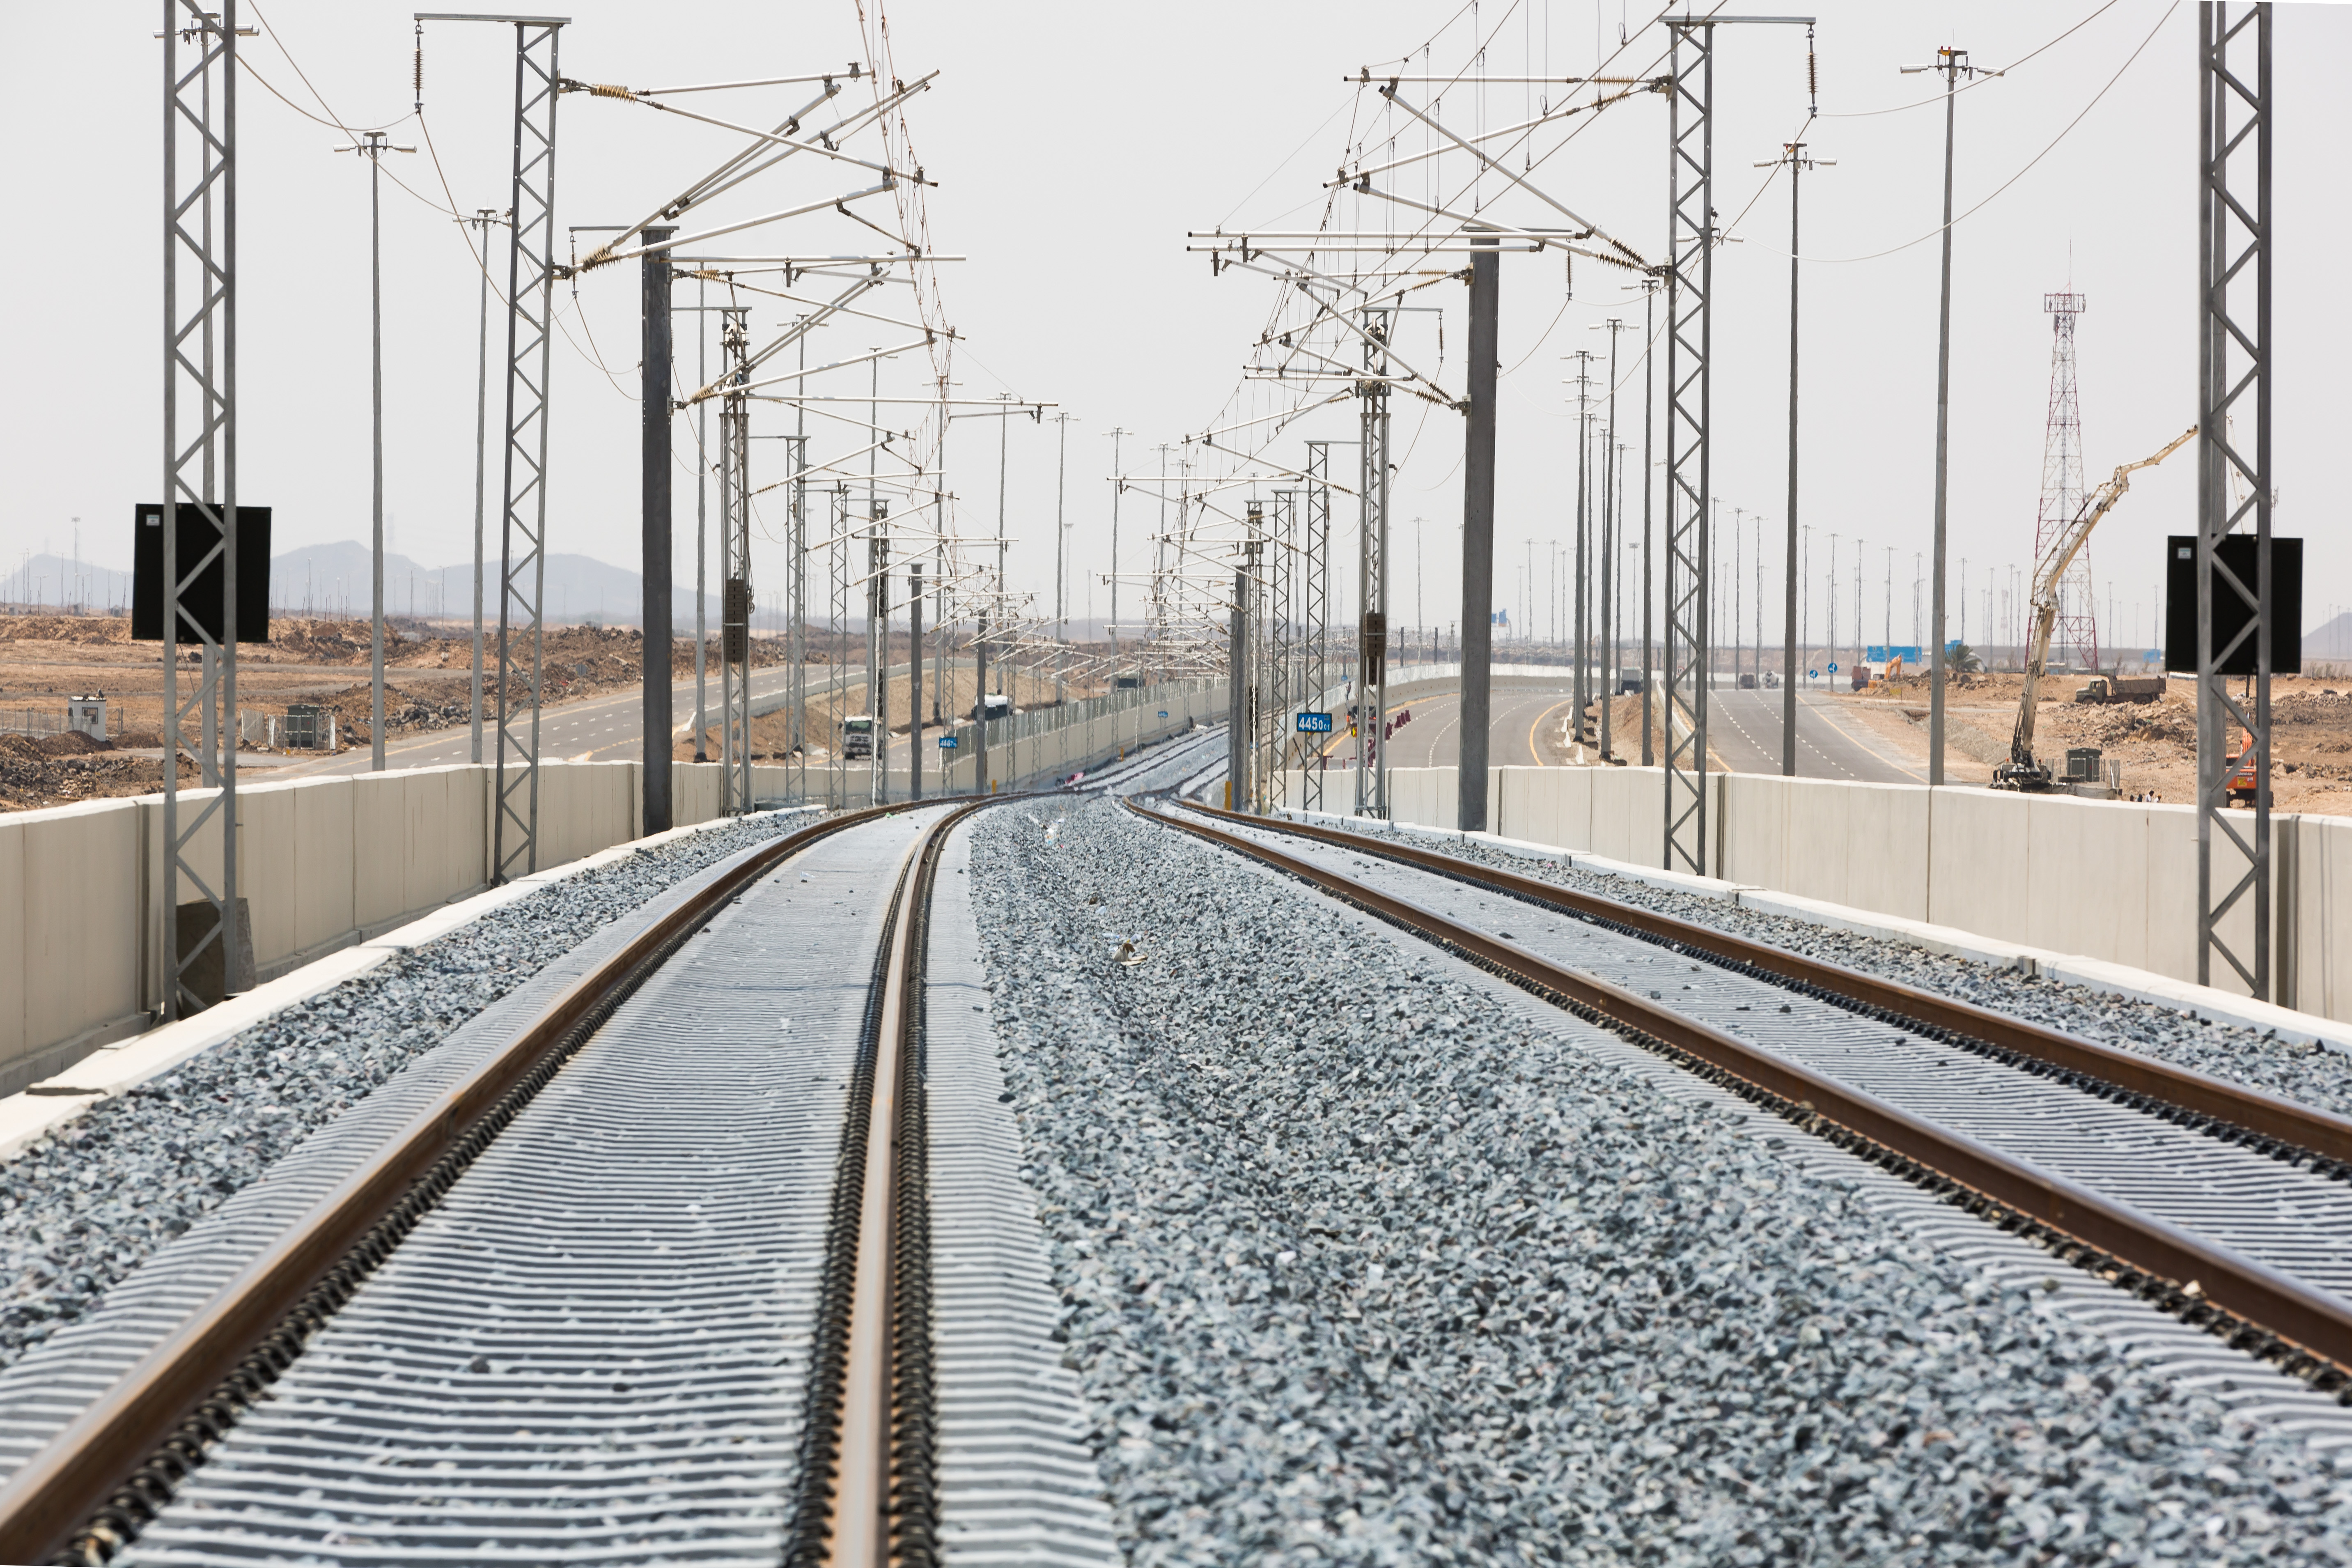 Línea de Alta Velocidad La Meca-Medina, Arabia Saudí